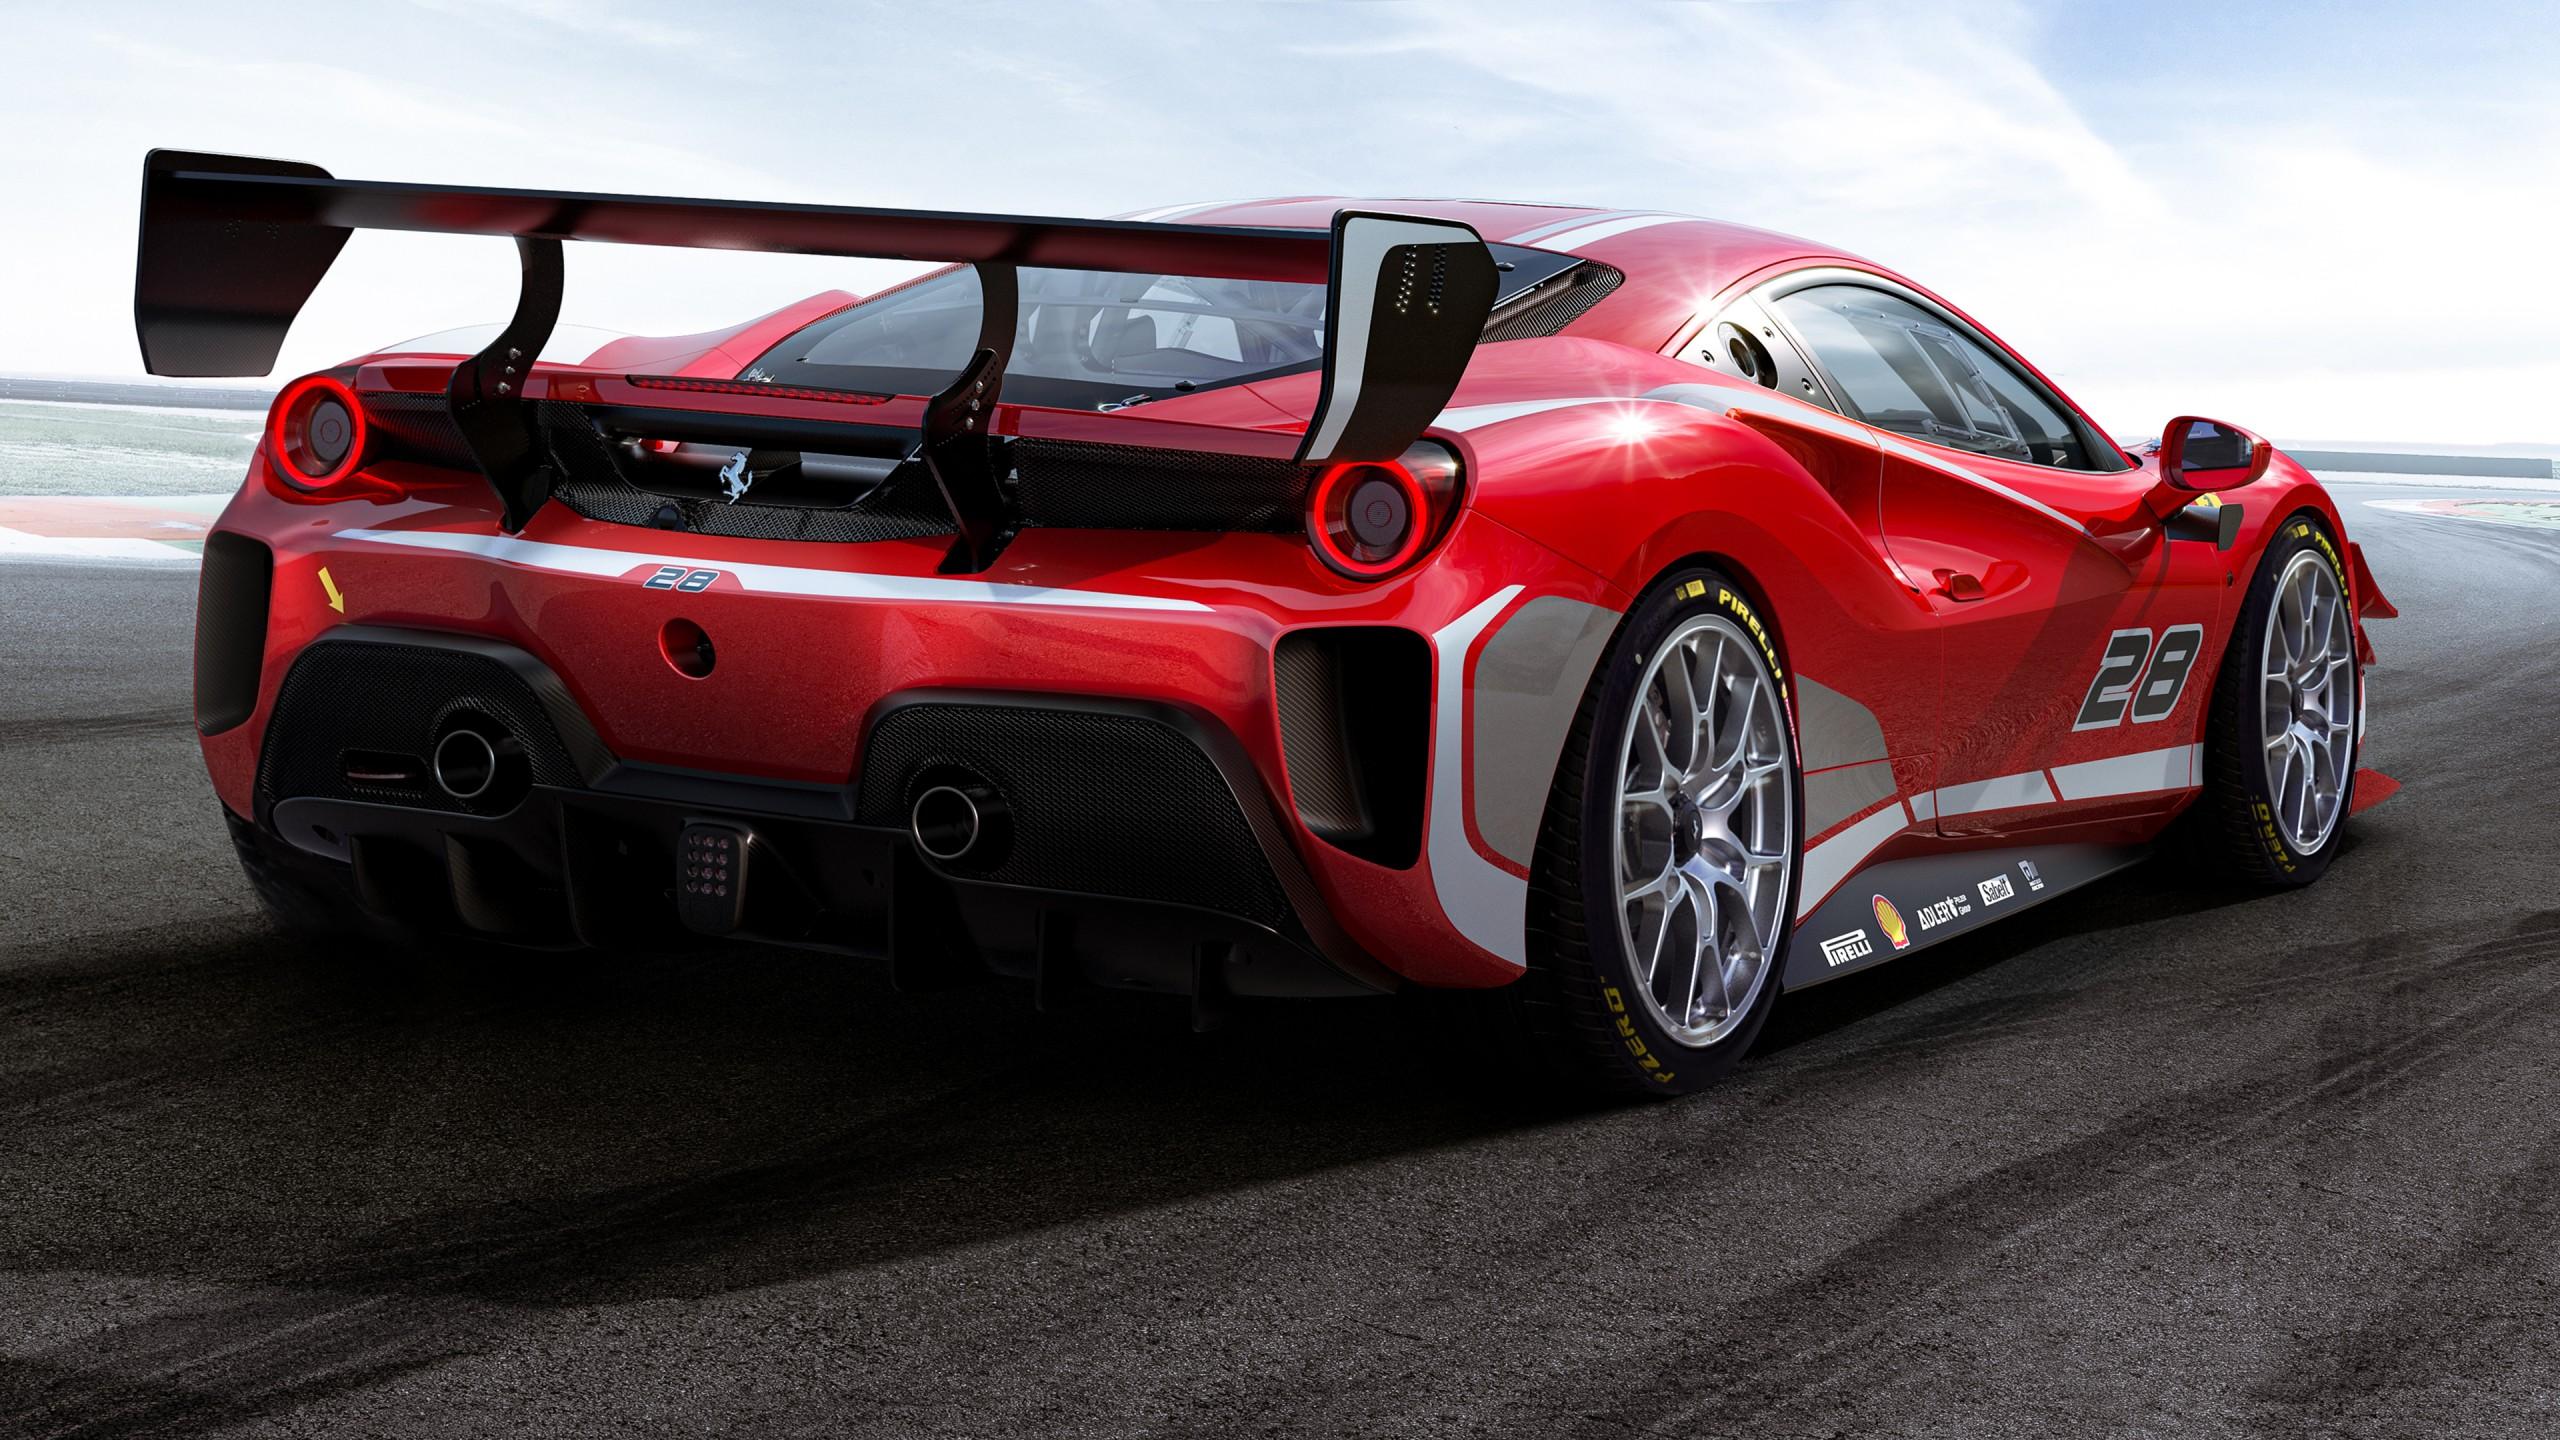 Ferrari 488 Challenge Evo 2020 4K Wallpaper | HD Car ...